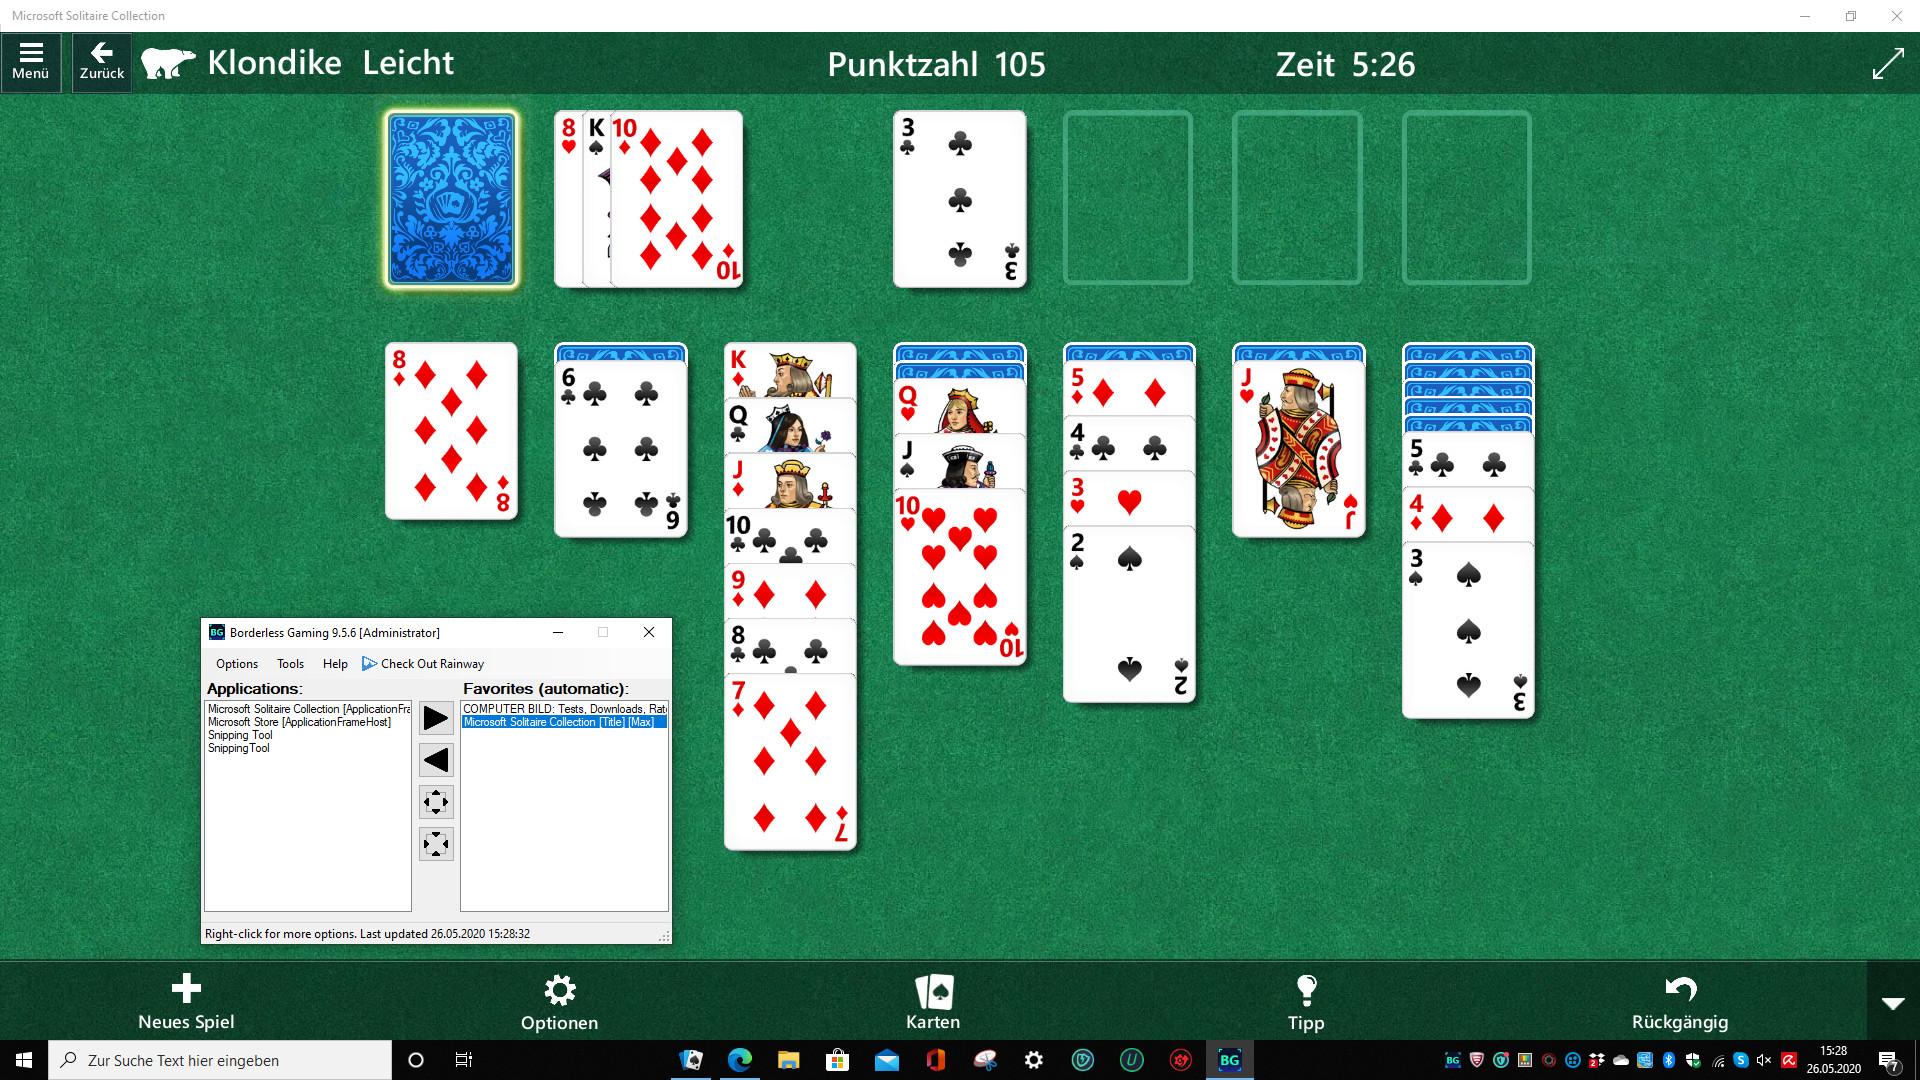 Screenshot 1 - Borderless Gaming